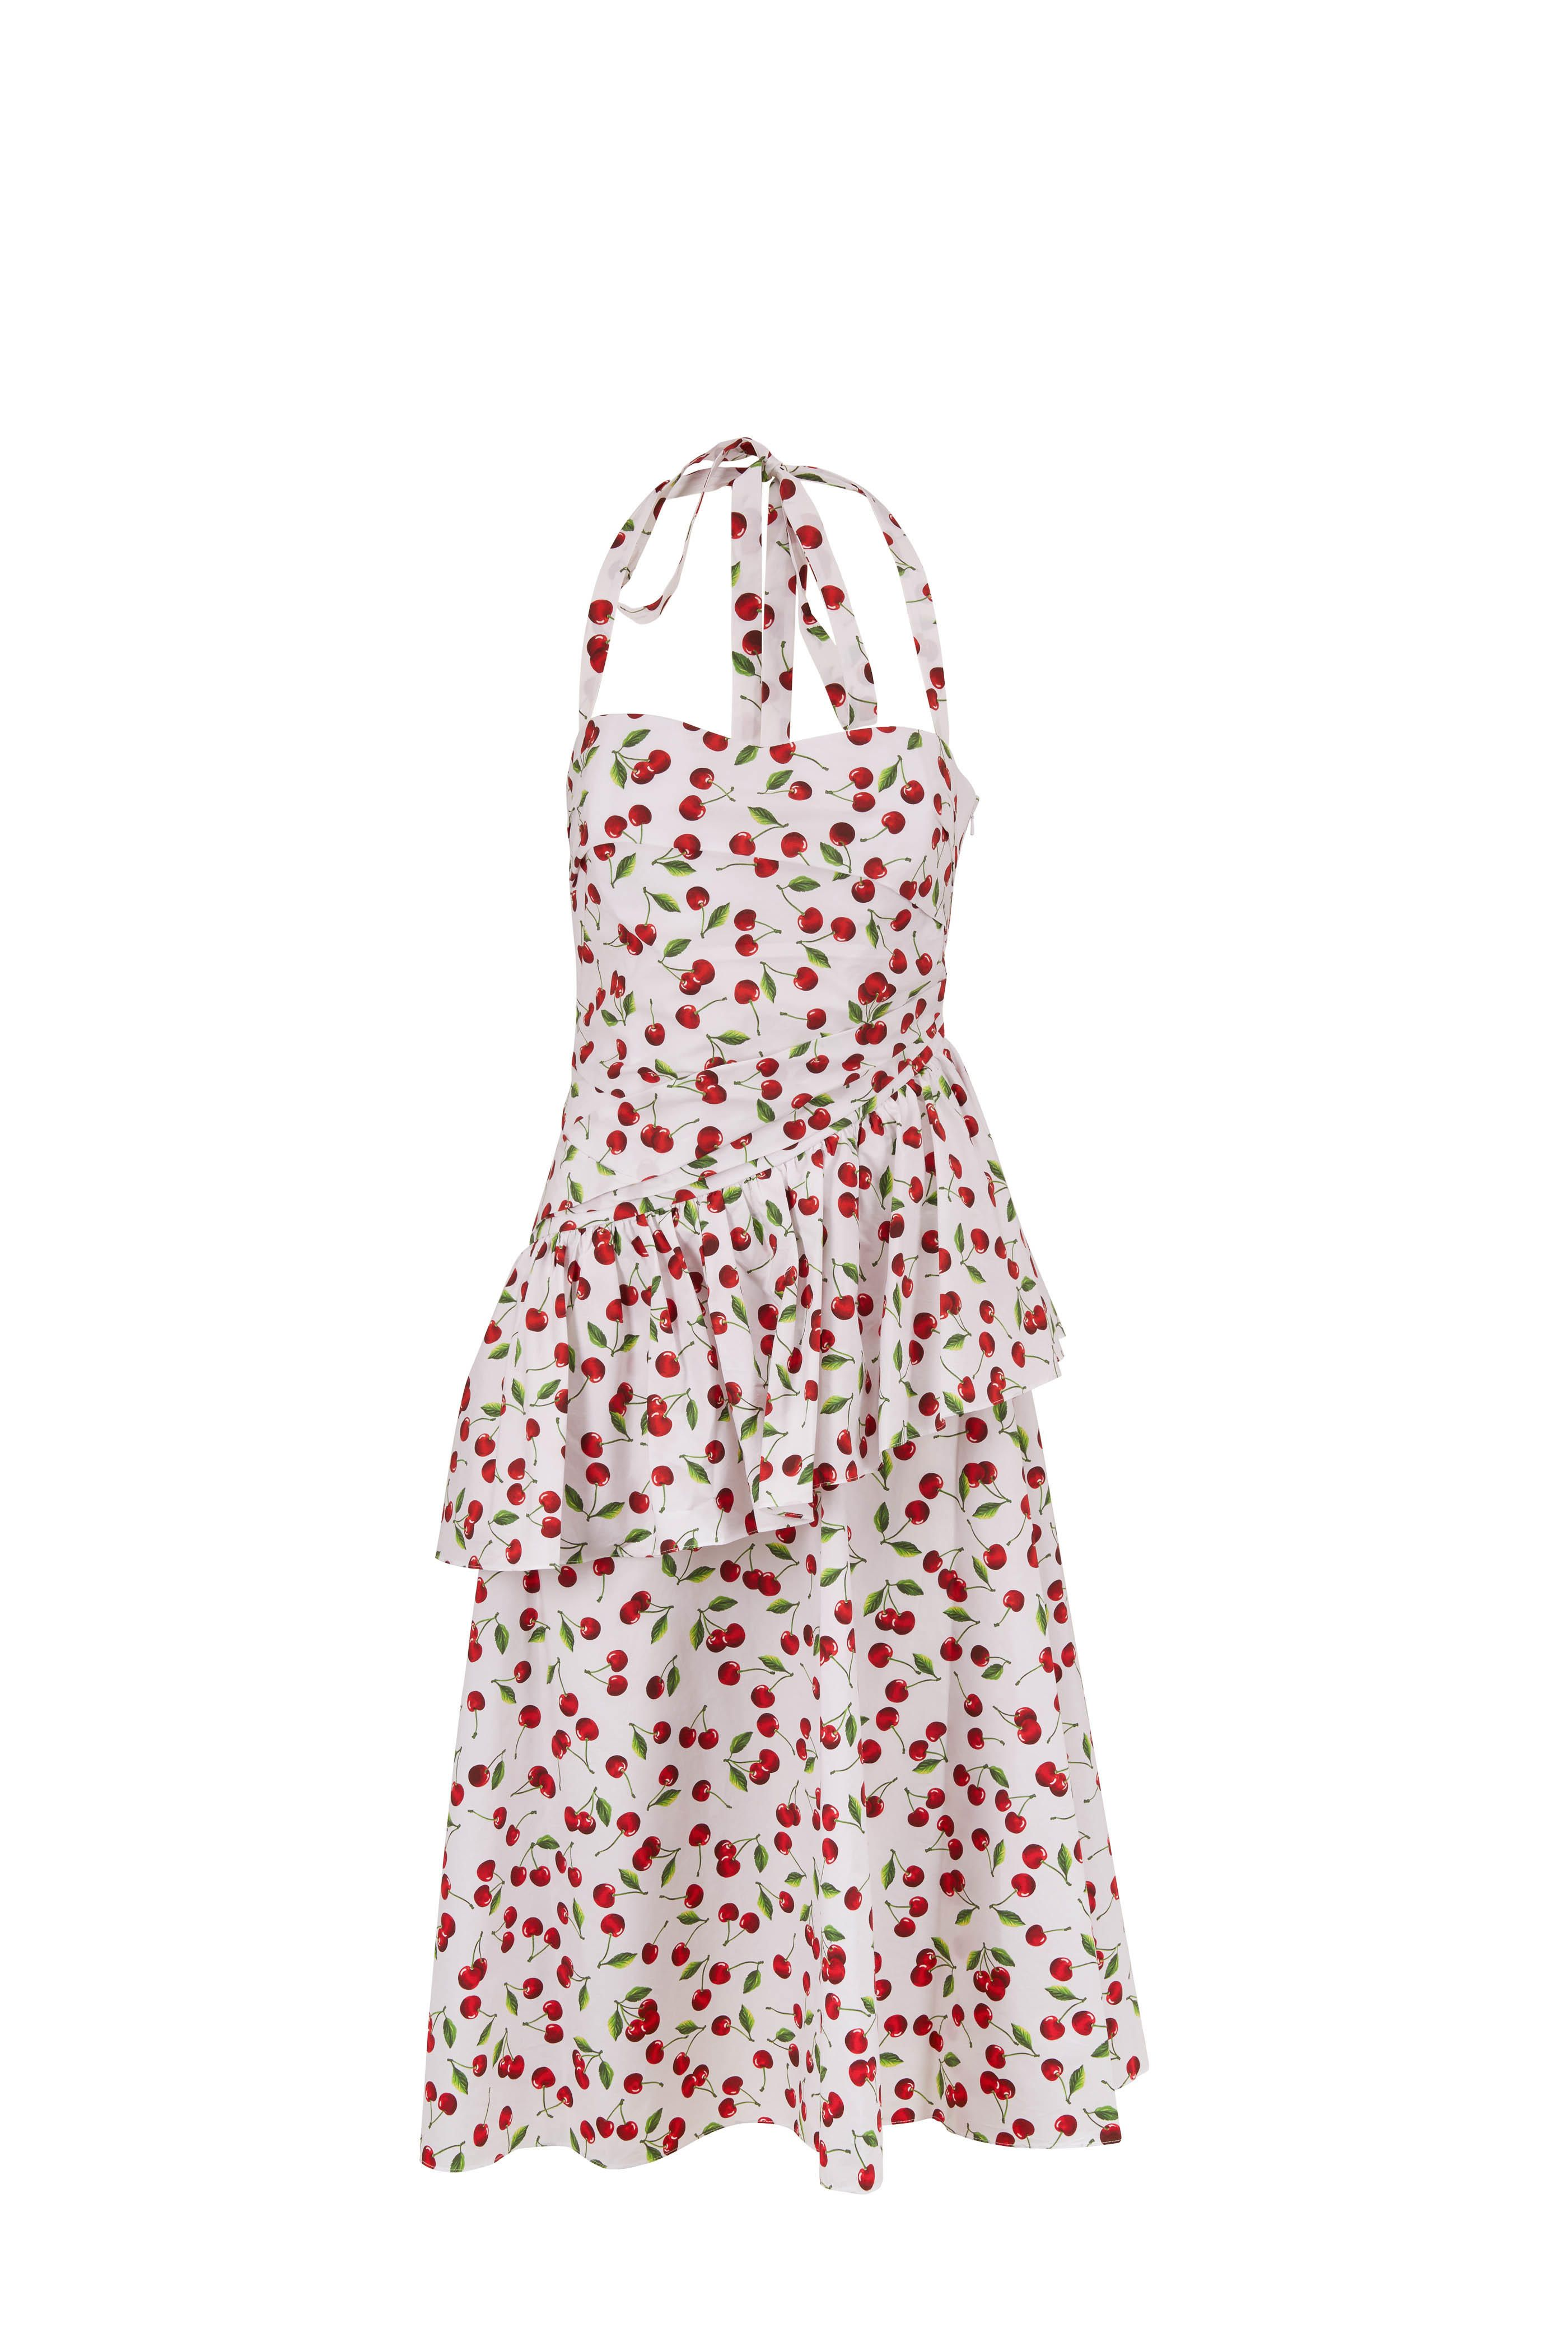 Michael Kors Collection Optic White Cherry Poplin Peplum Halter Dress Michael Kors Collection Halter Dress Dresses [ 4200 x 2800 Pixel ]